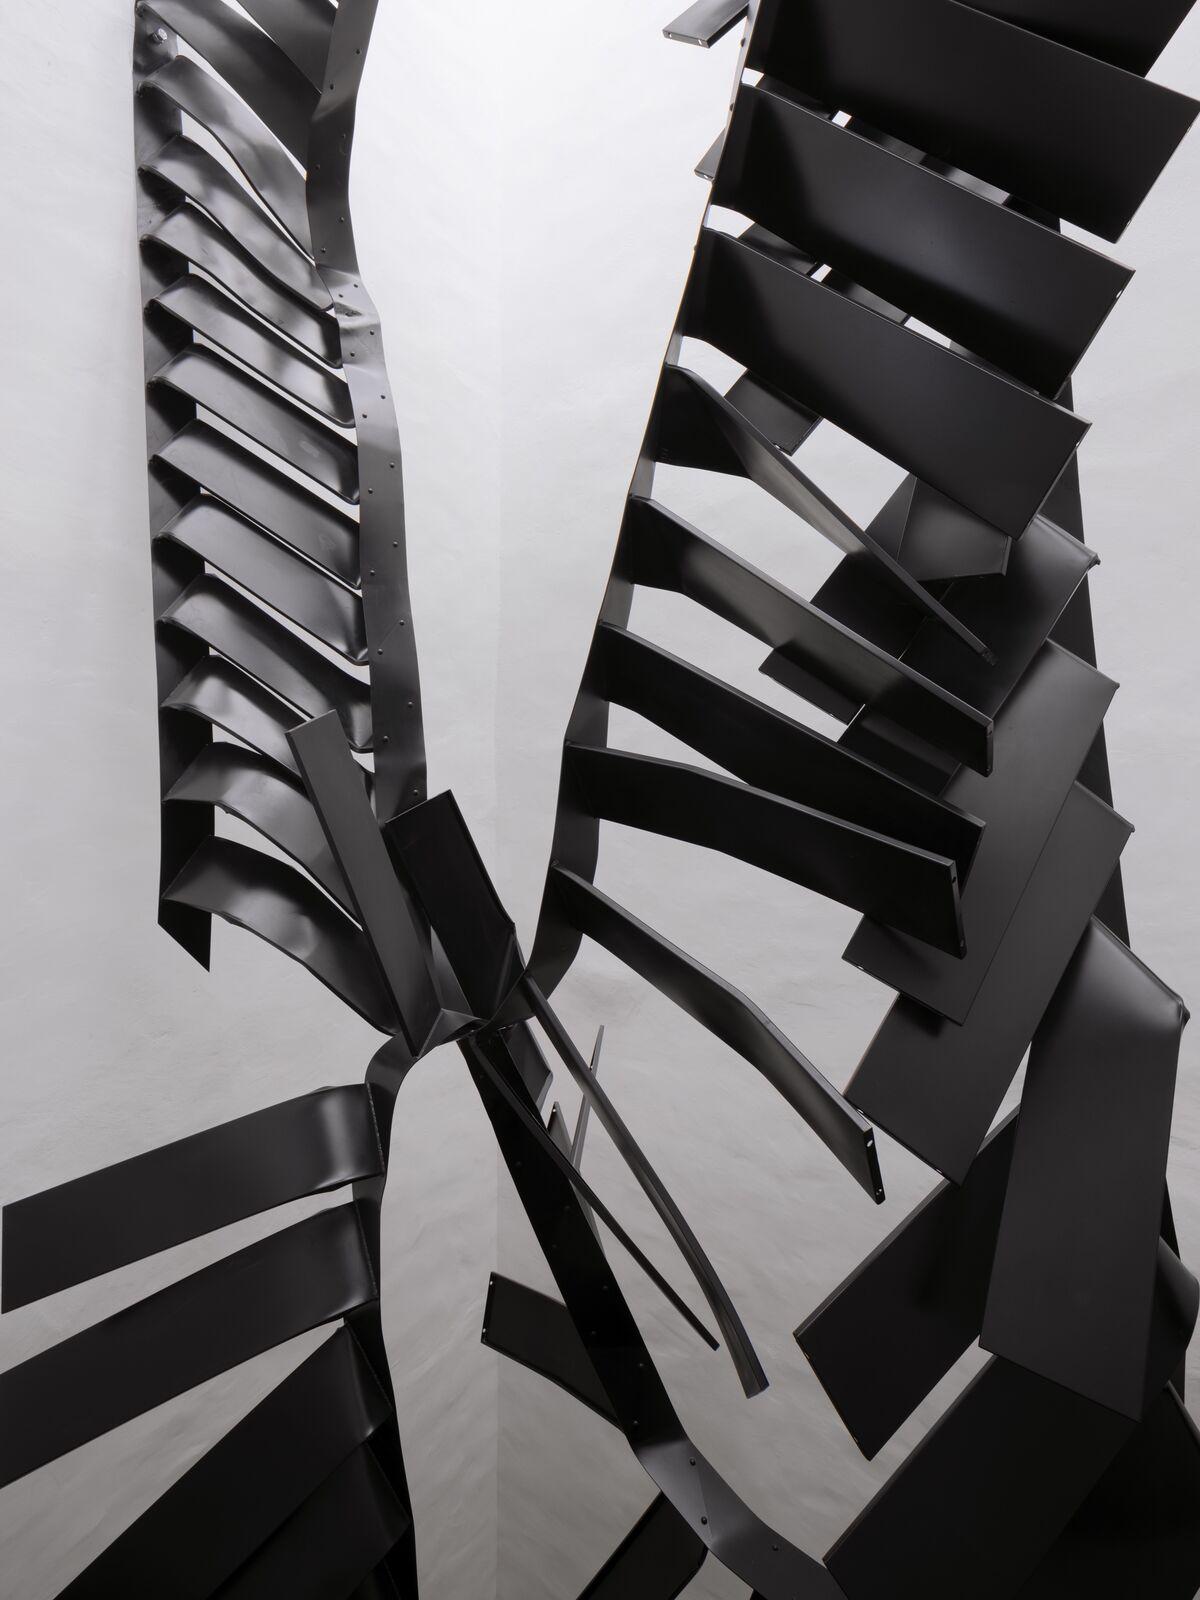 Monika Sosnowska, Stairs, 2016–17. Photo © Studio Stefano Graziani, Muzeum Susch, Art Stations Foundation CH. Courtesy of the artist and Muzeum Susch, Art Stations Foundation,CH.